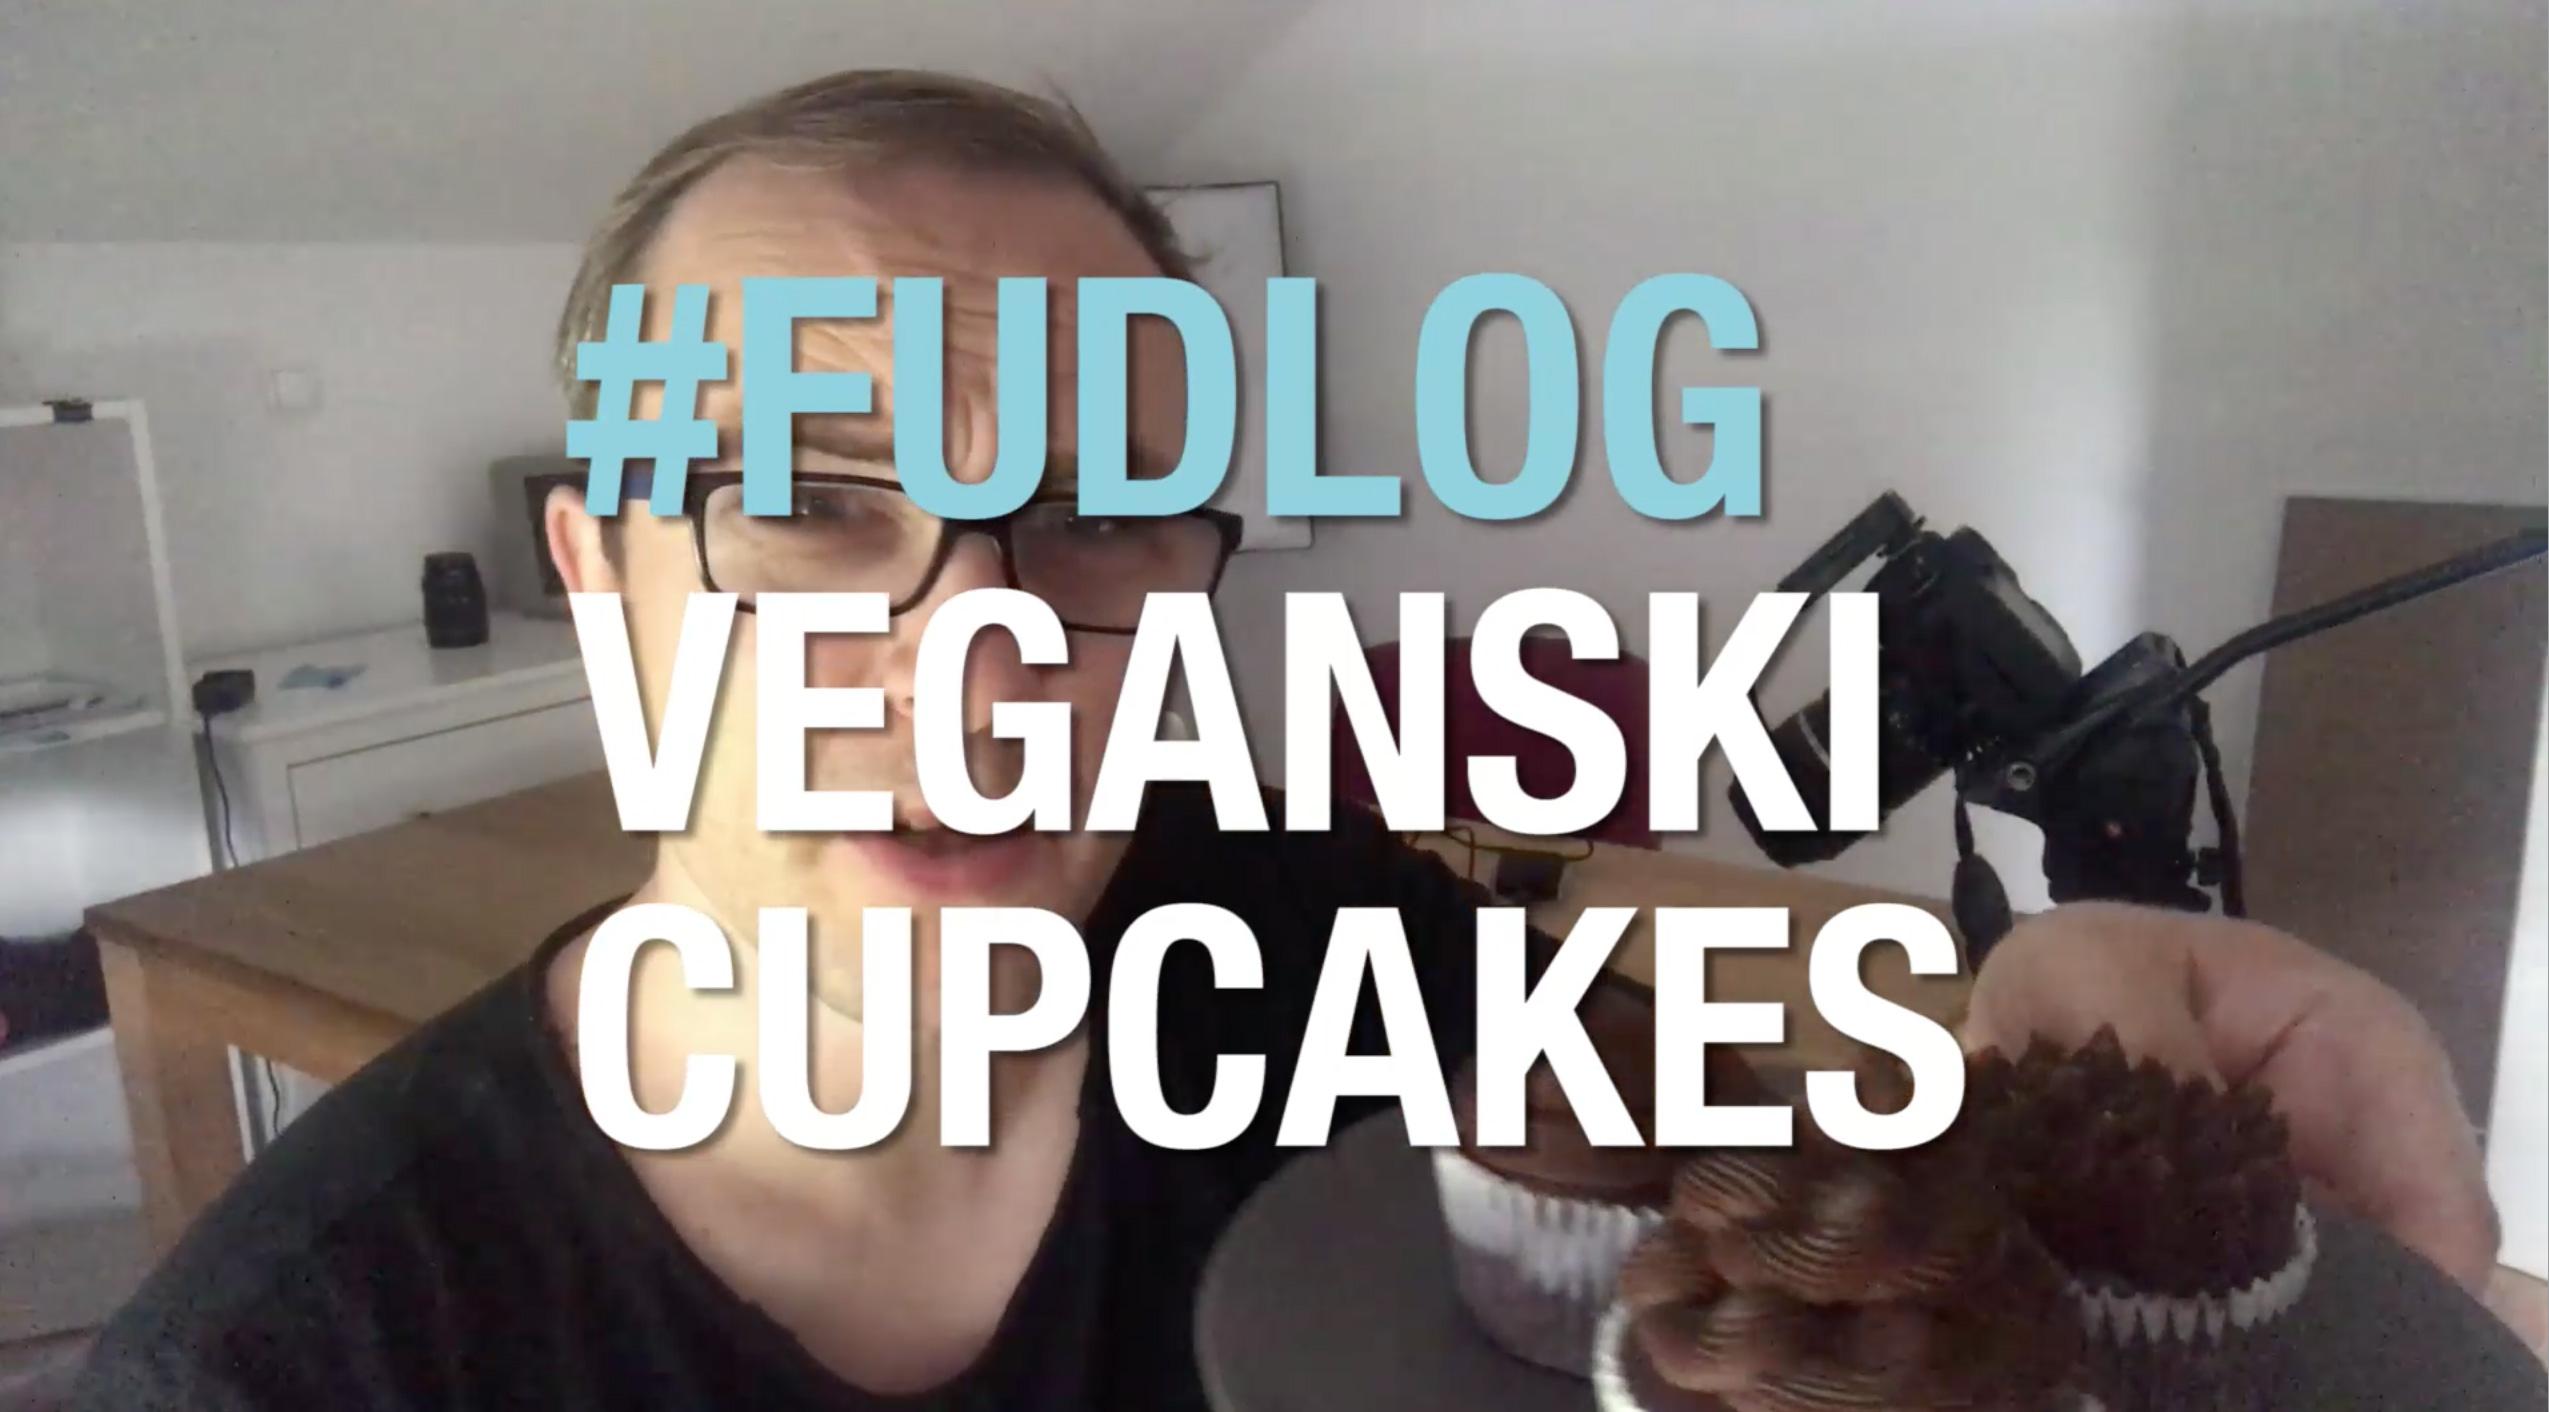 FUDLOG veganski cupcake